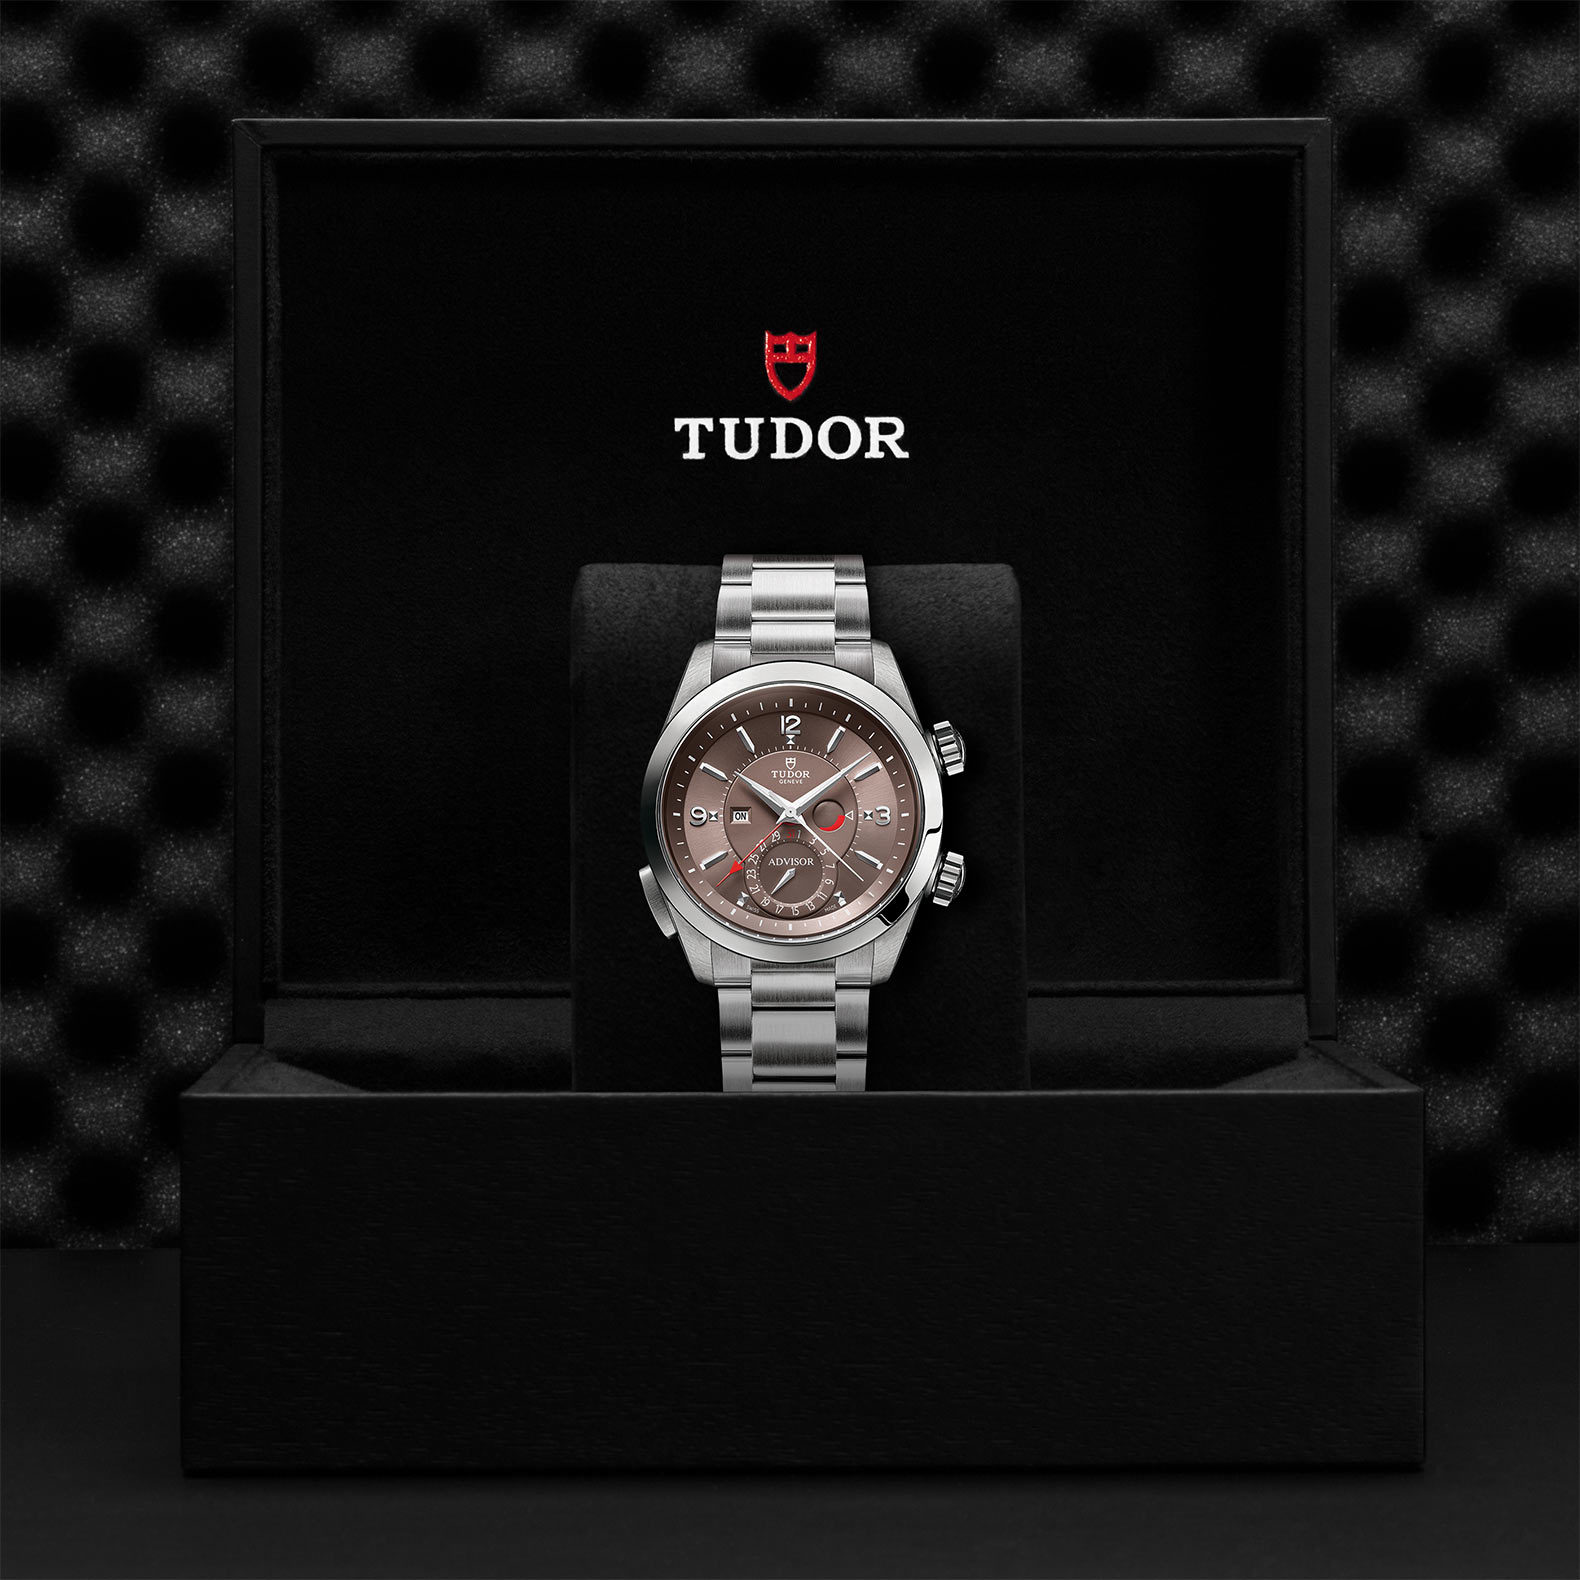 TUDOR Heritage Advisor - M79620TC-0005